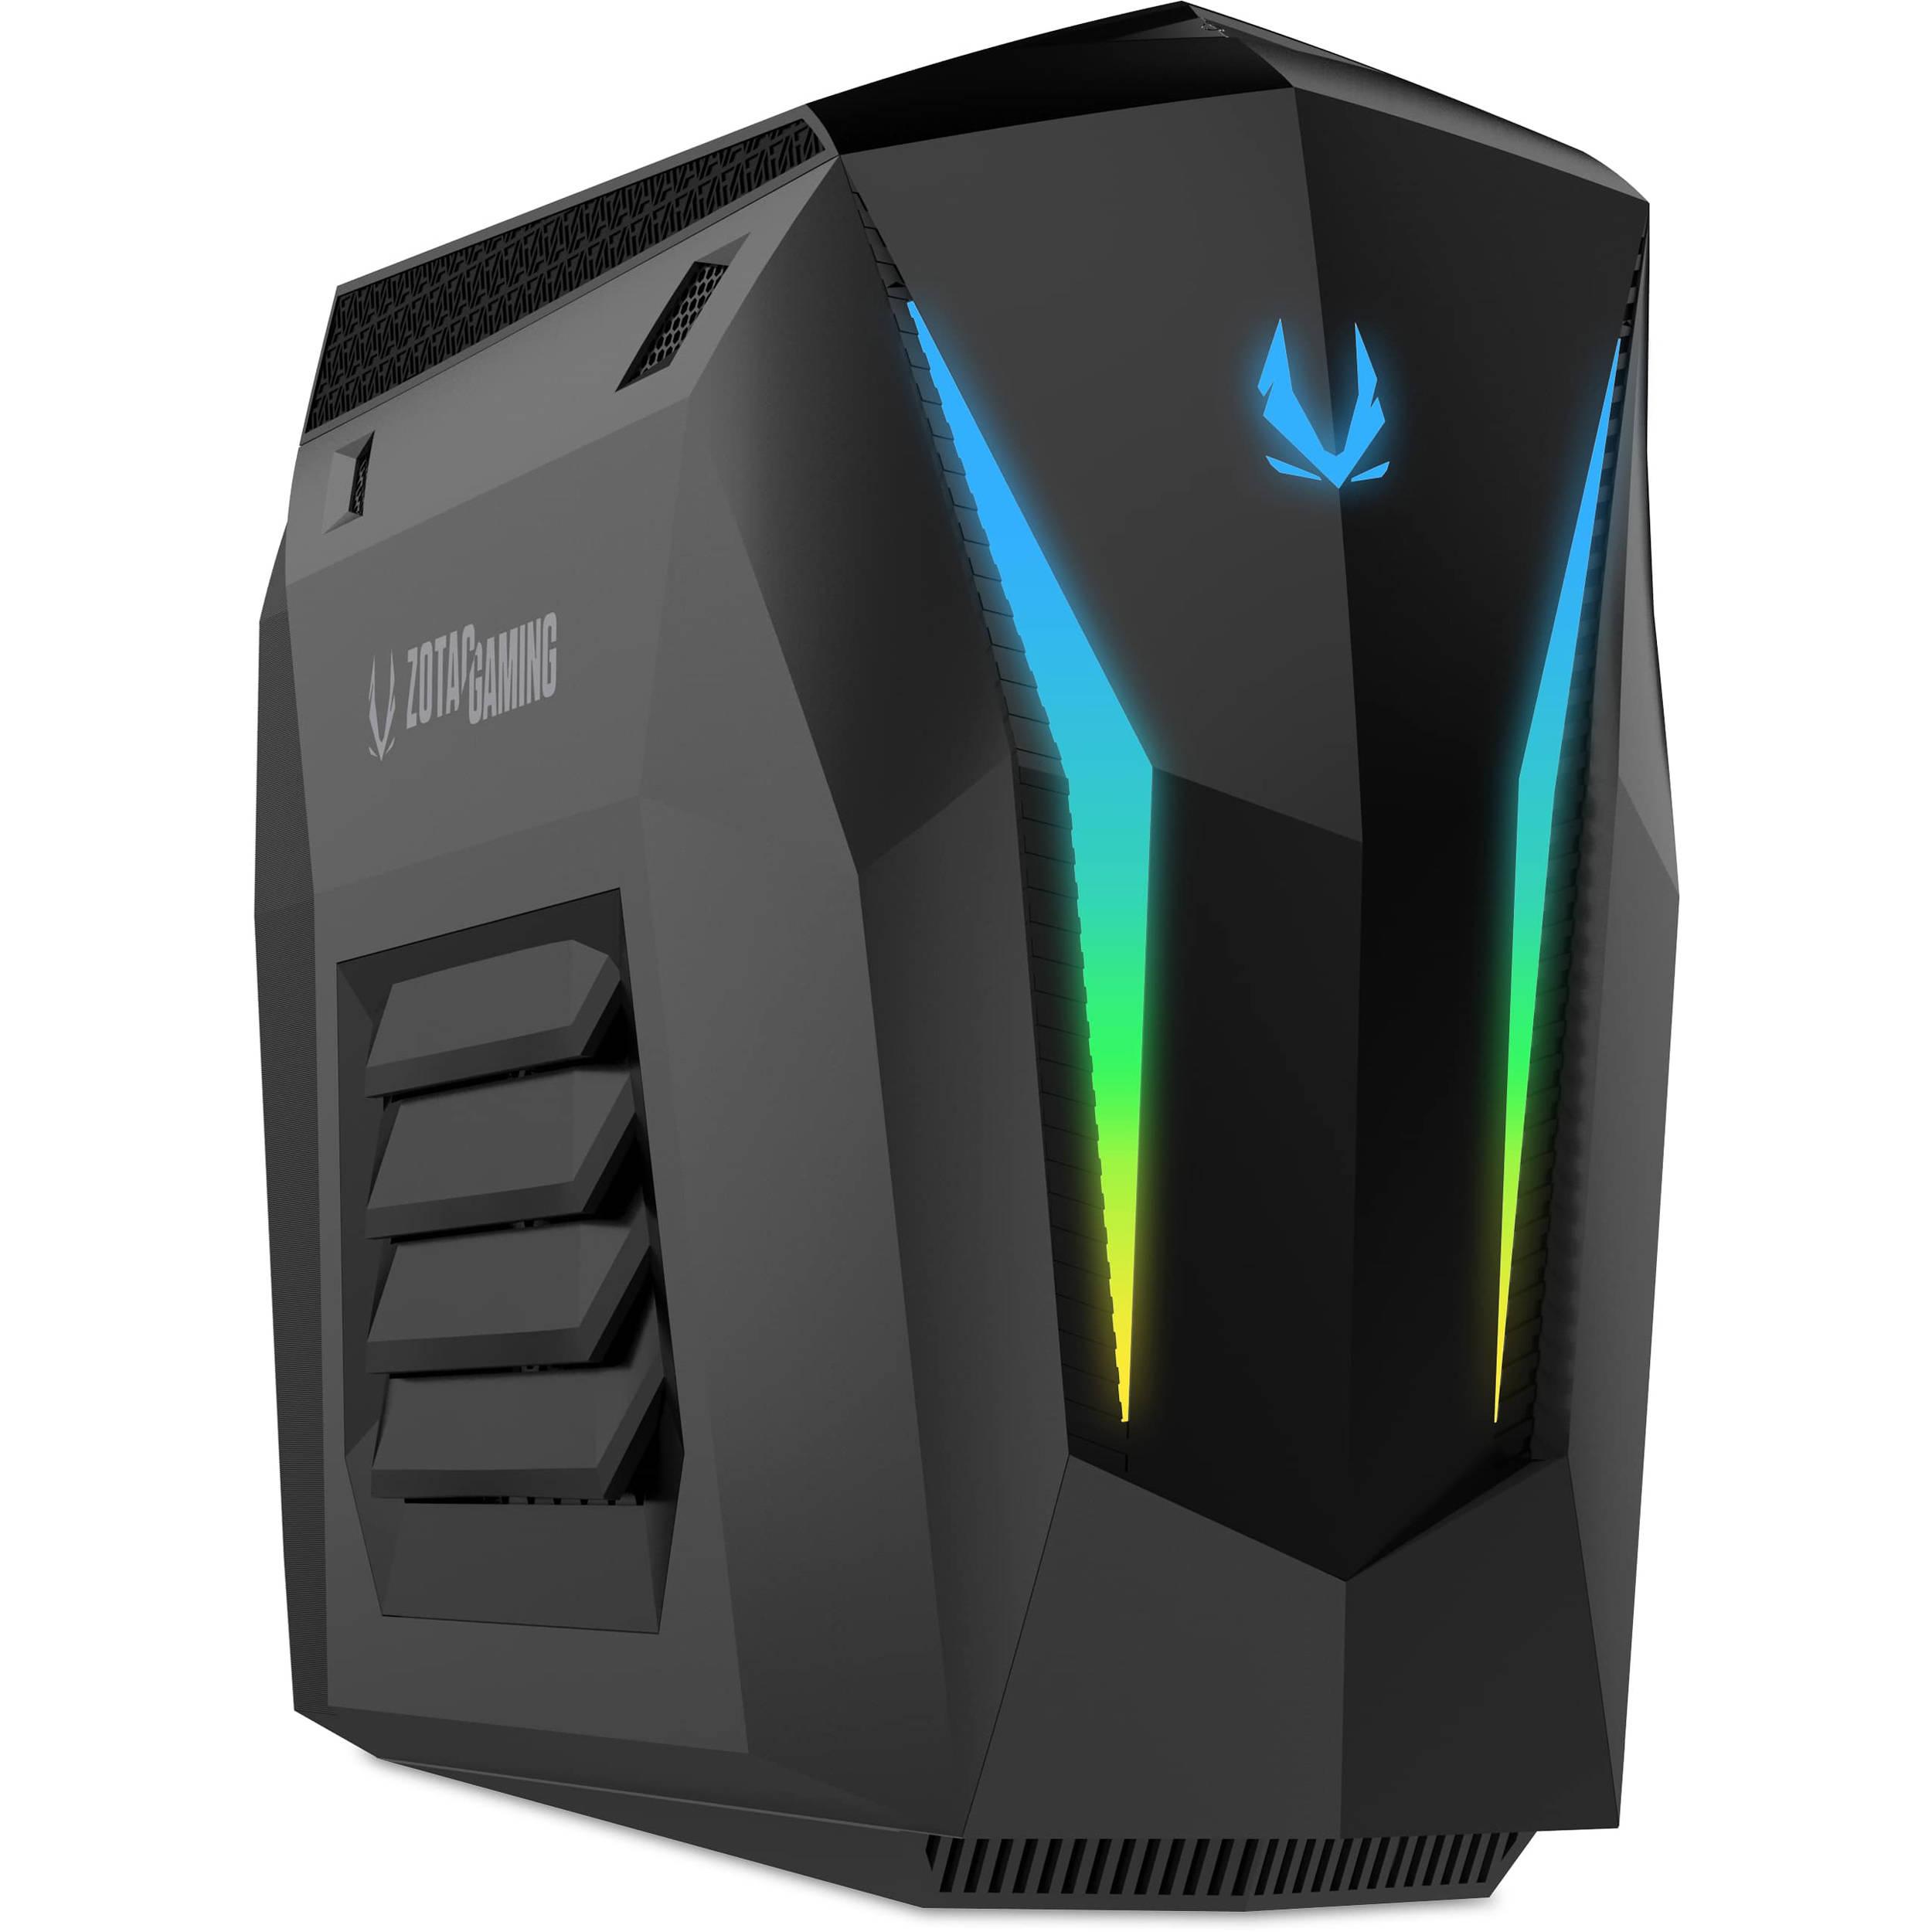 ZOTAC MEK MINI Desktop Computer